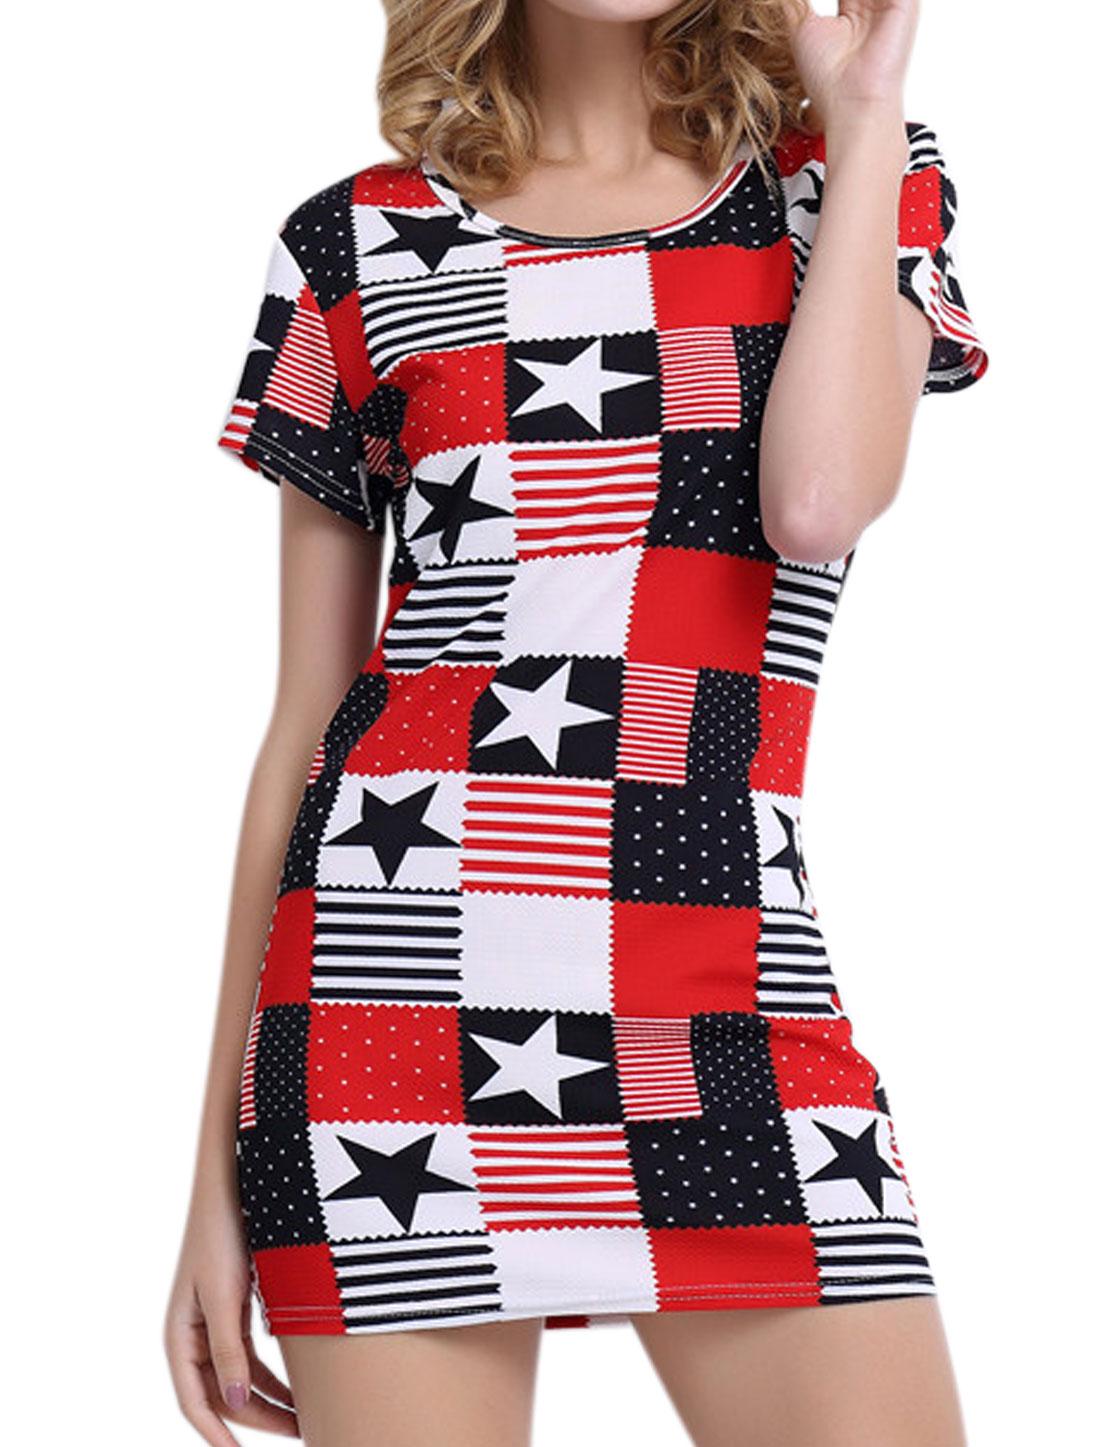 Women Short Sleeves Round Neck Stars Stripes Sheath Dress Multi-Color M